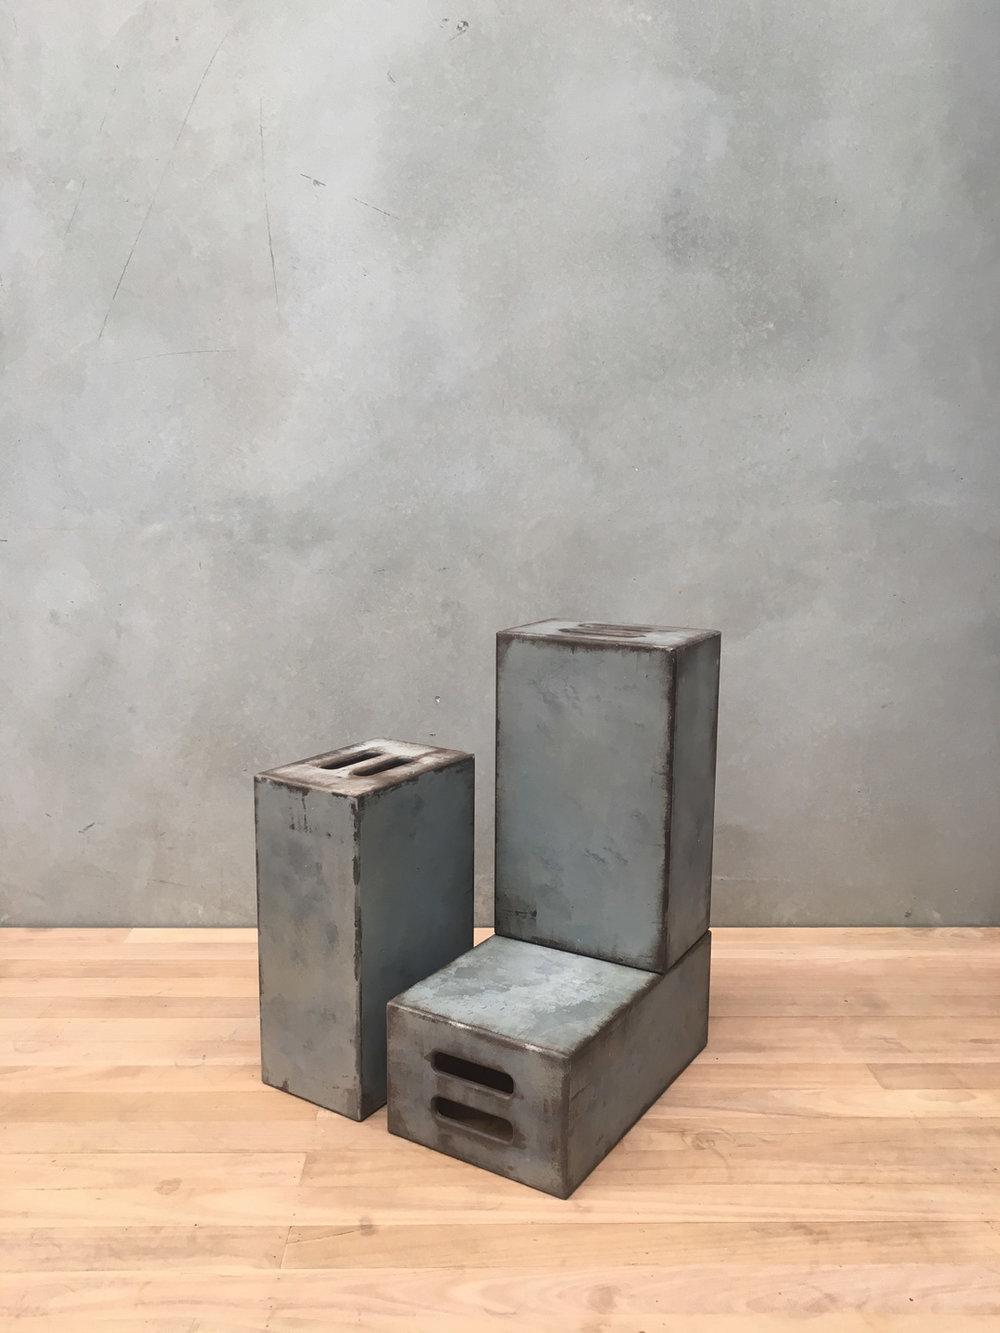 300 X 200 X 500 FULL APPLE BOXES RUST / GREY